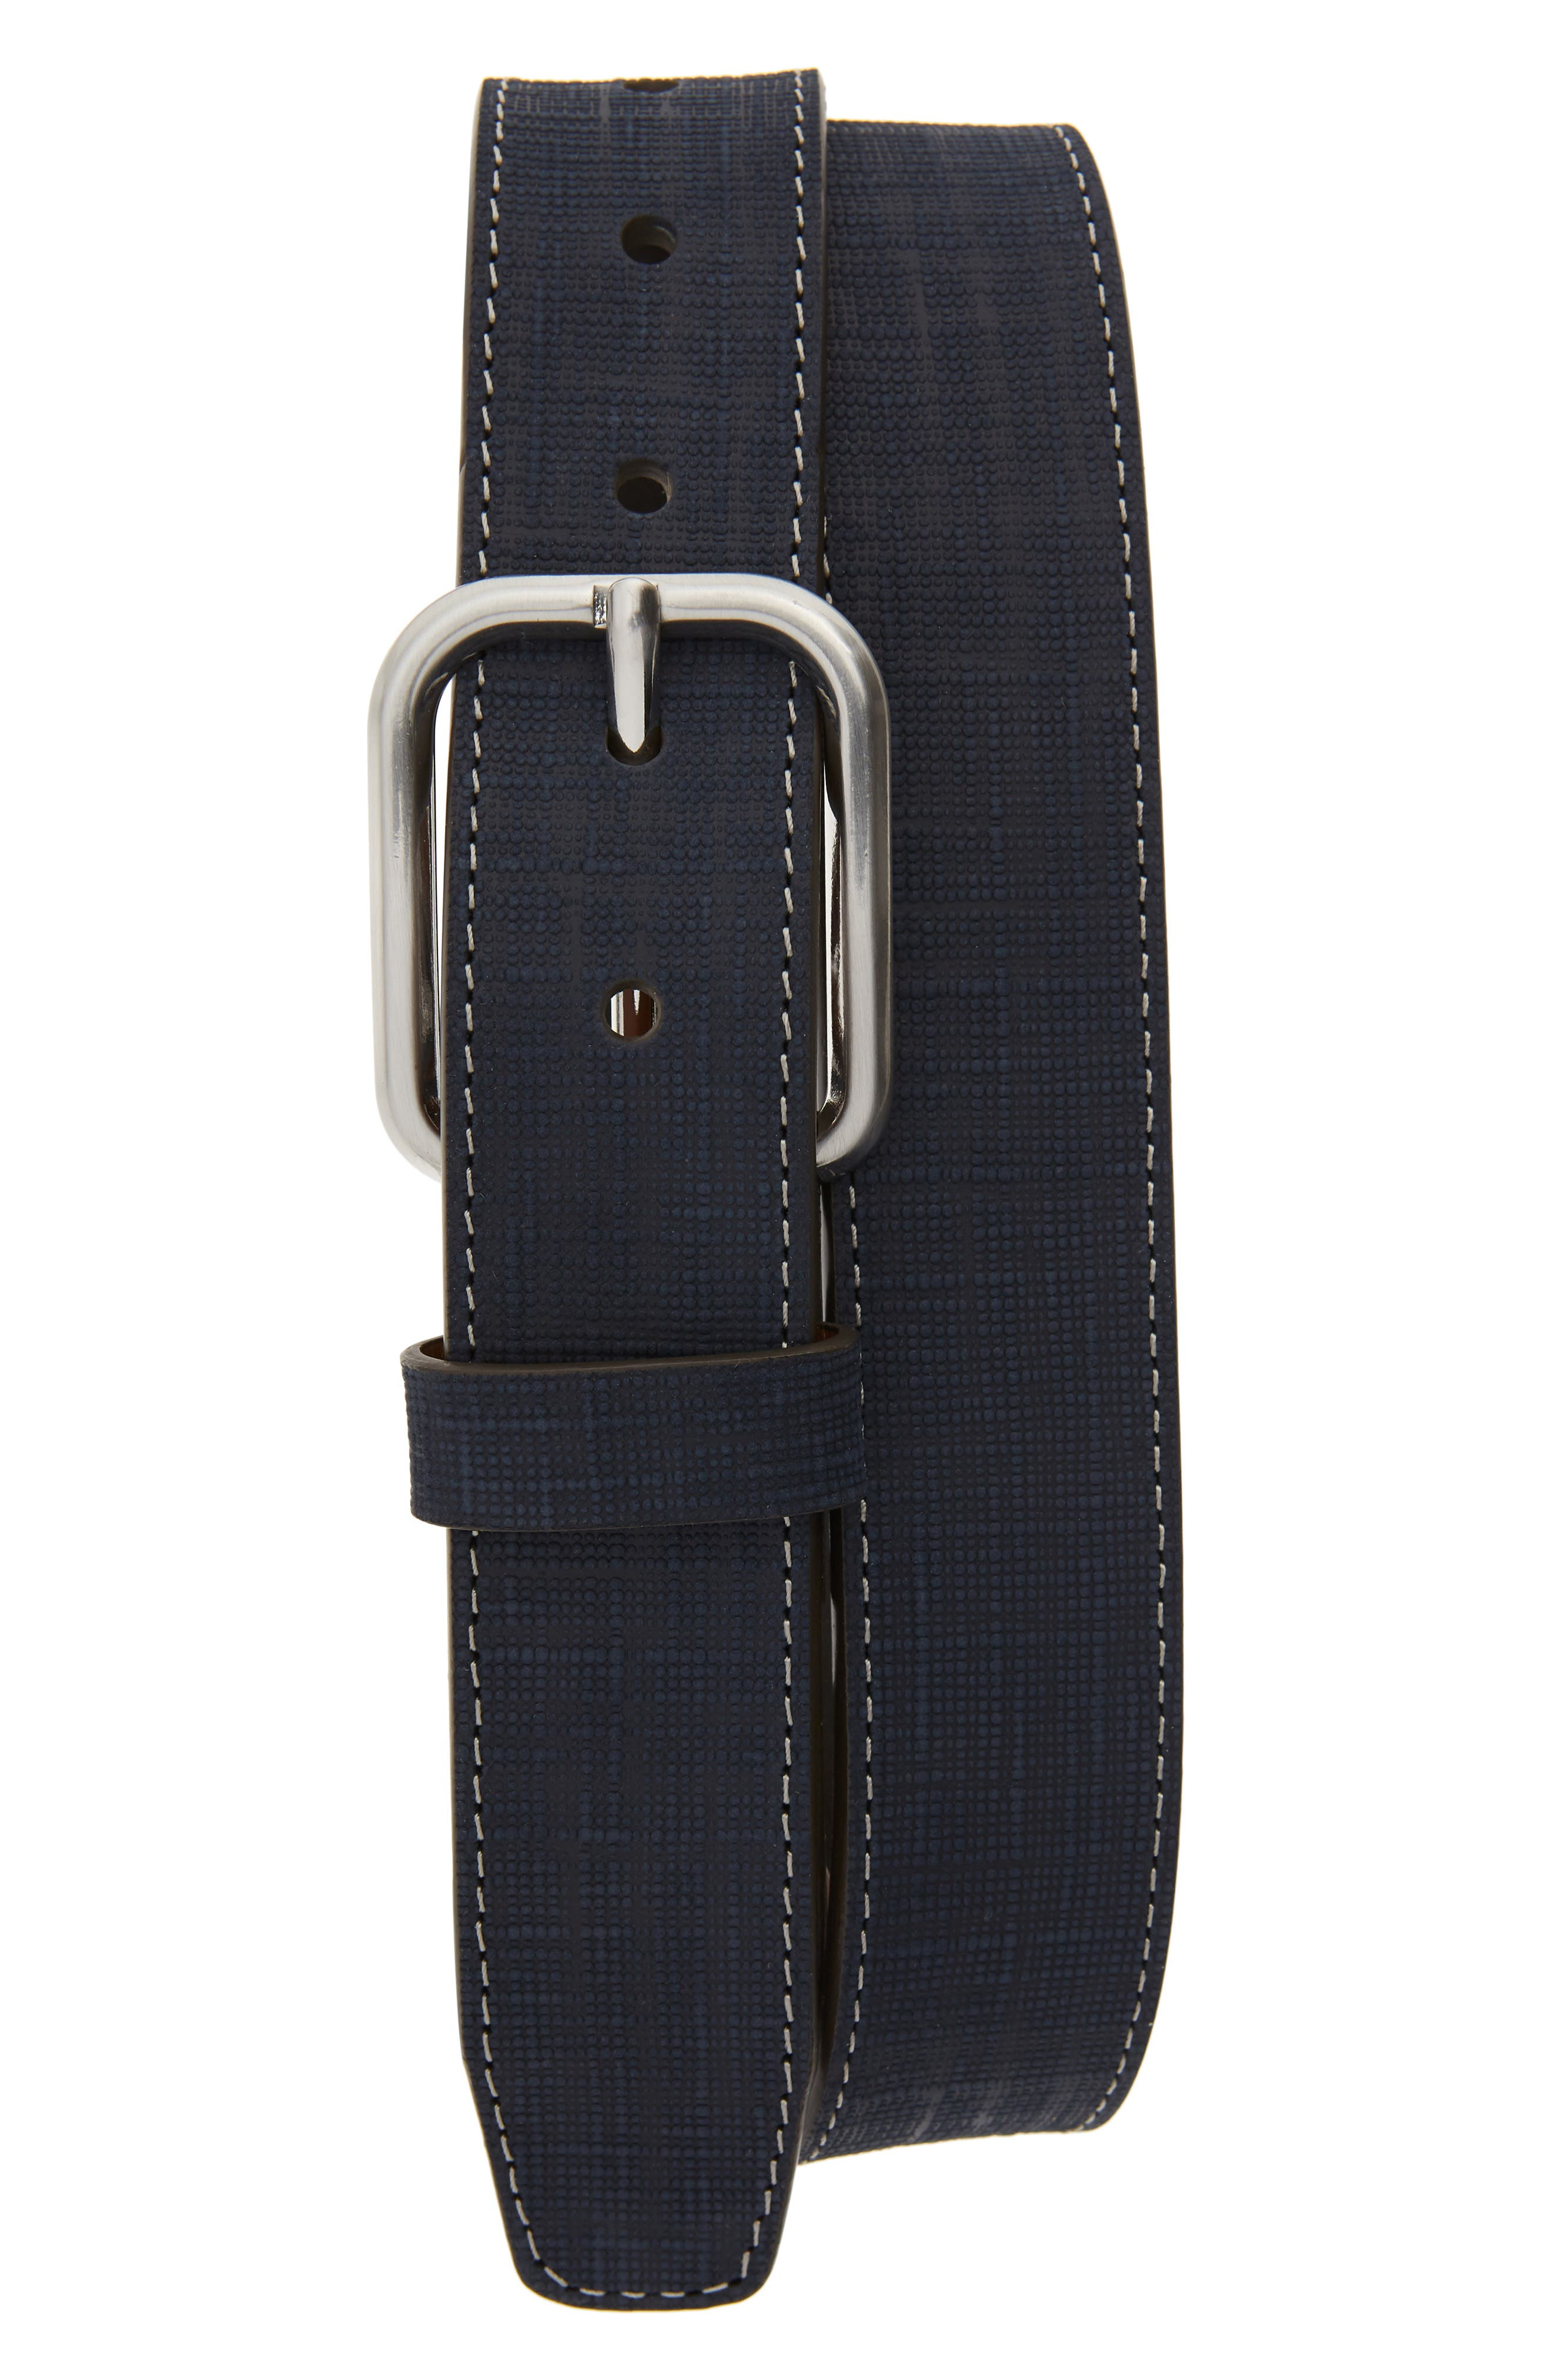 Johnston & Murphy Crosshatch Leather Belt, Navy